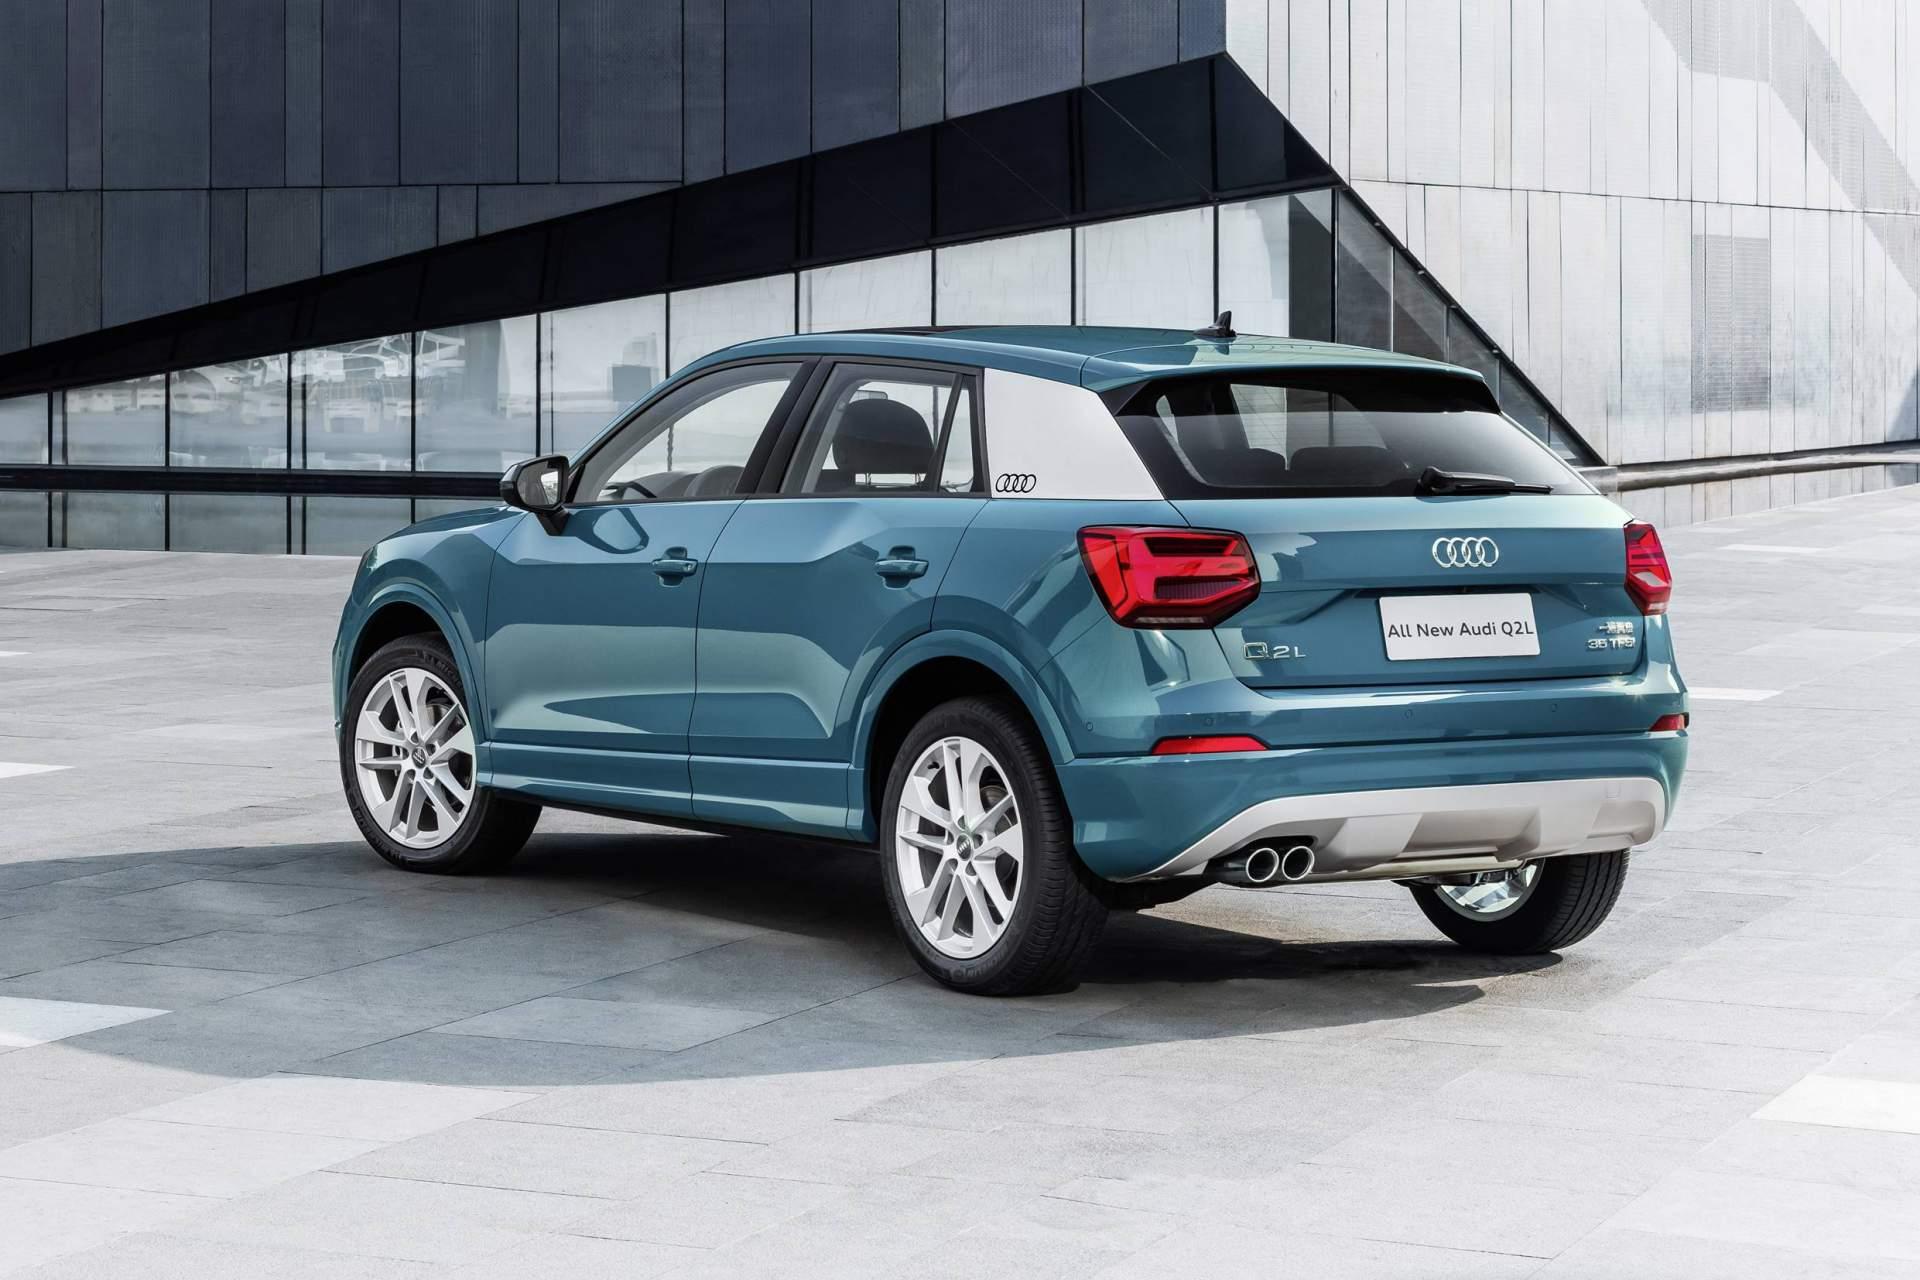 Audi_Q2_L_0025